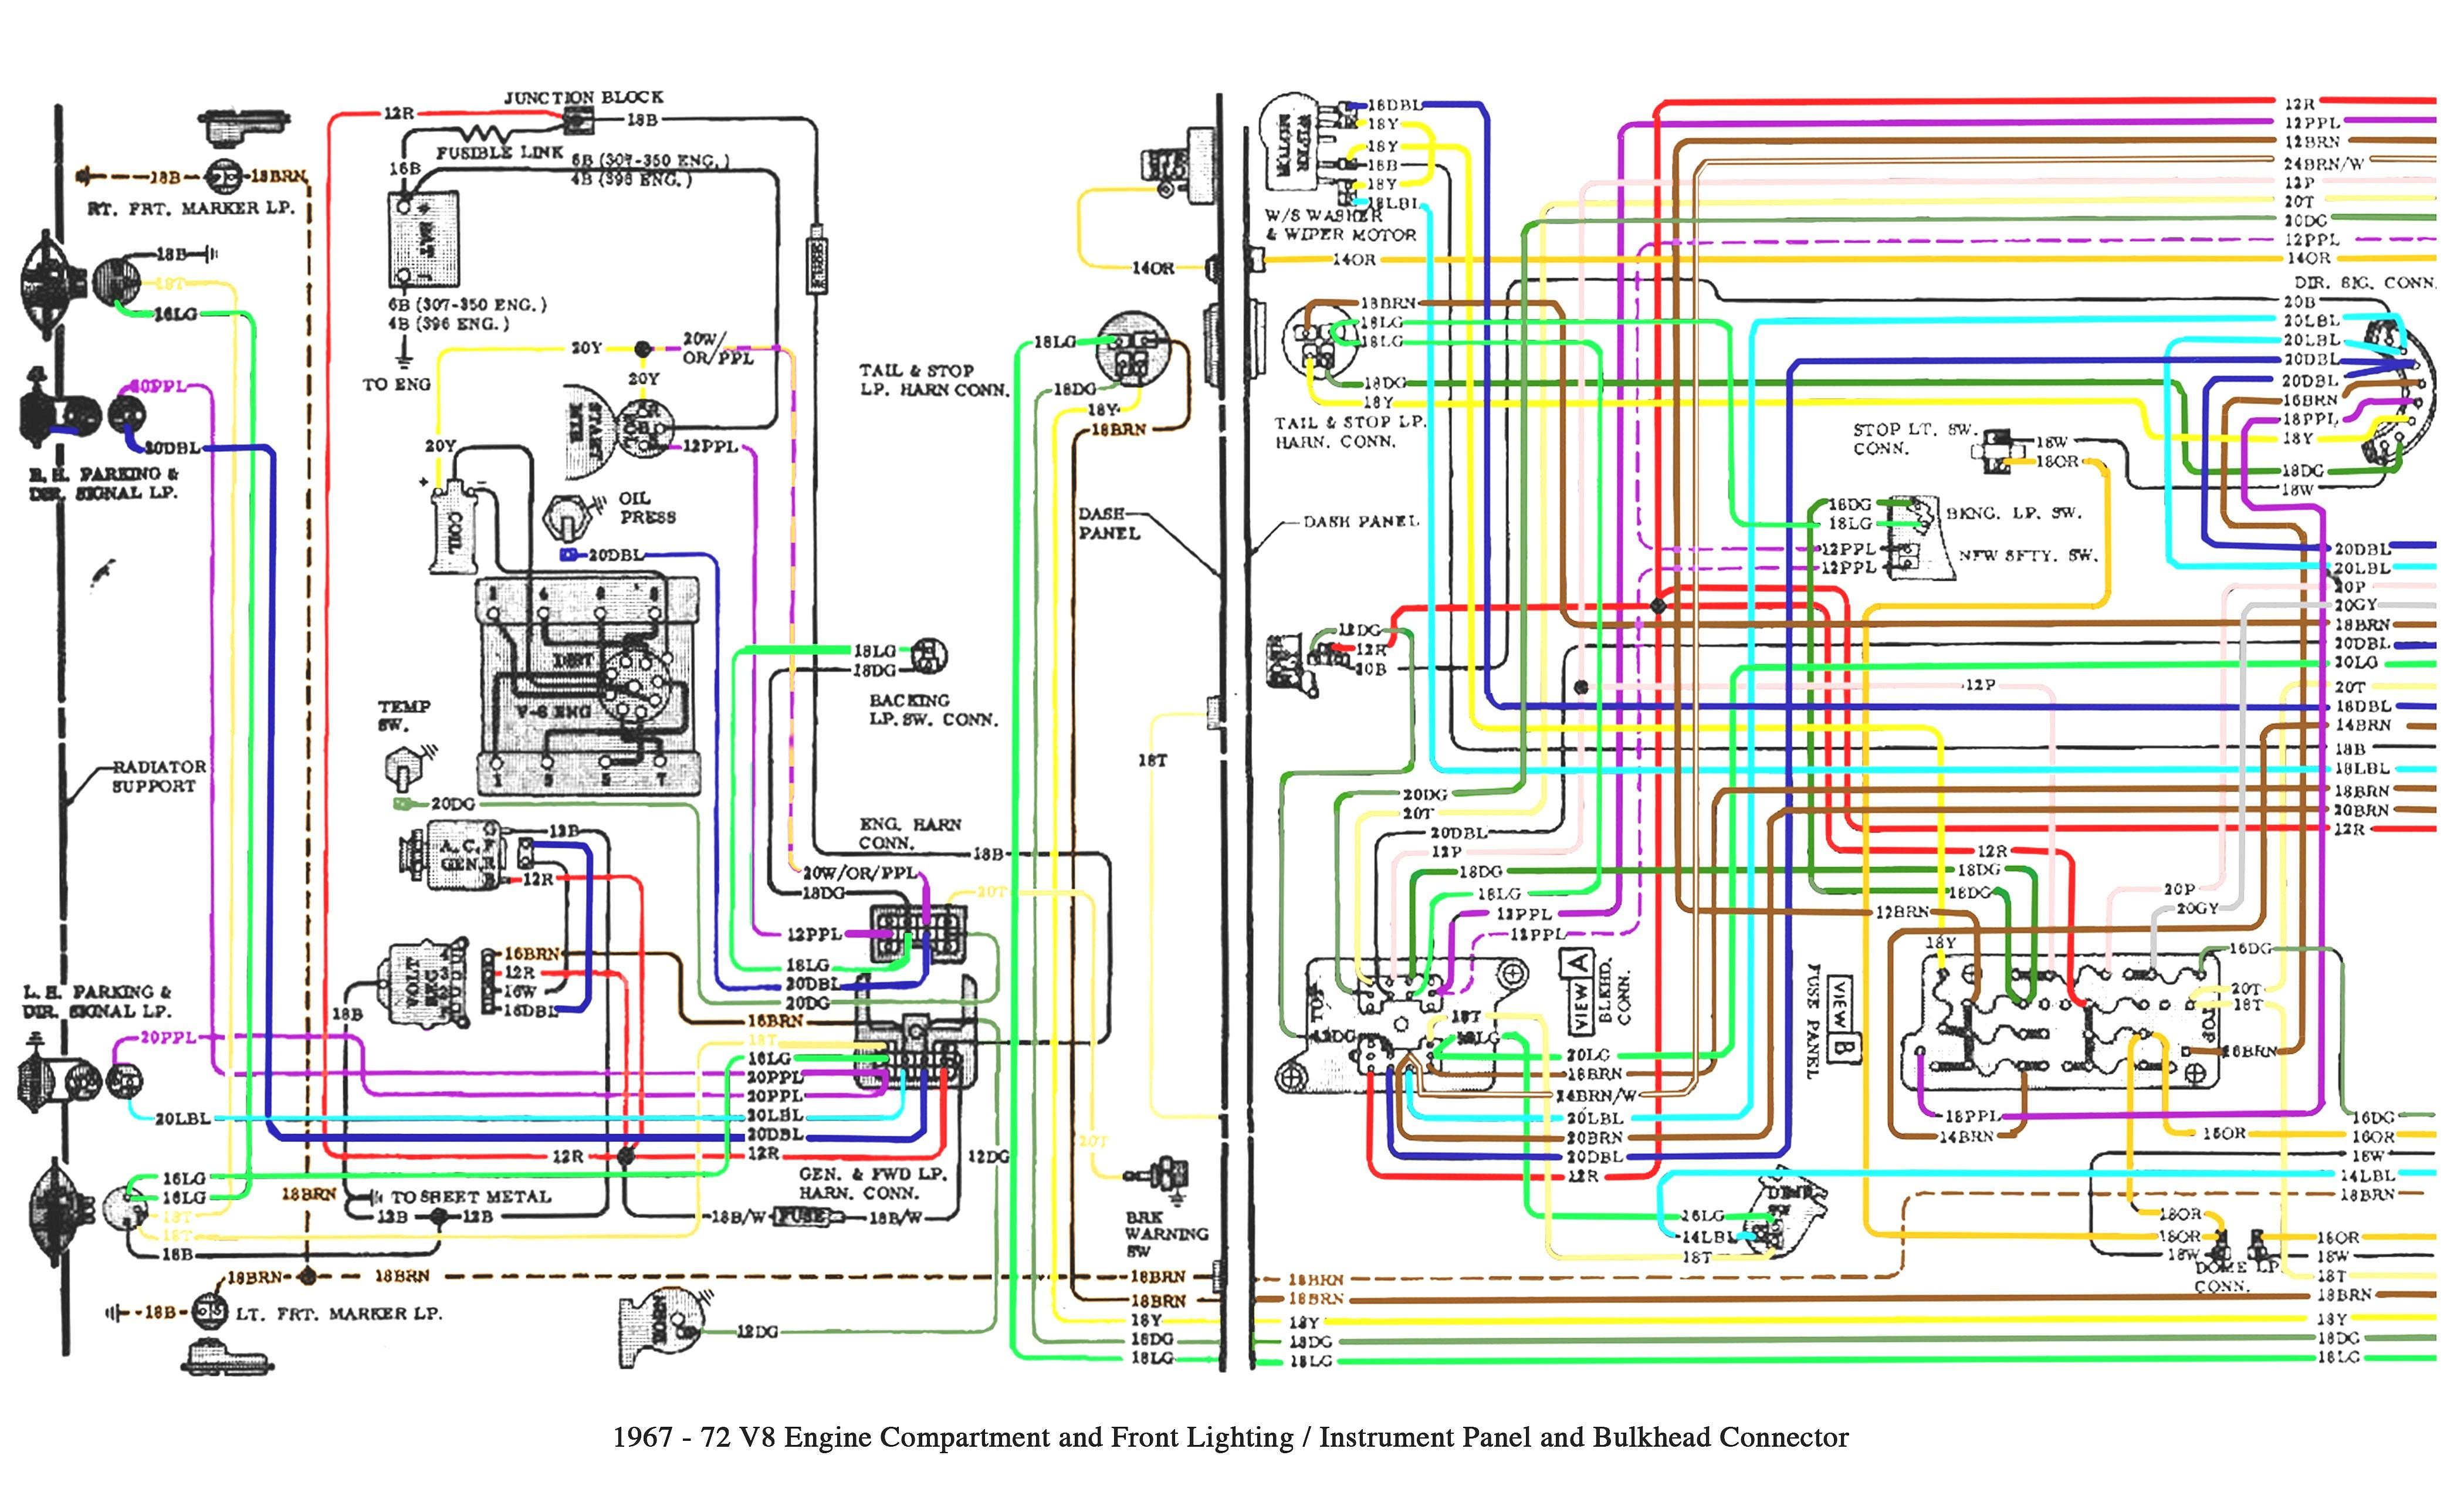 Ez 21 Wiring Diagram   Wiring Diagram - Ez Wiring 21 Circuit Harness Diagram